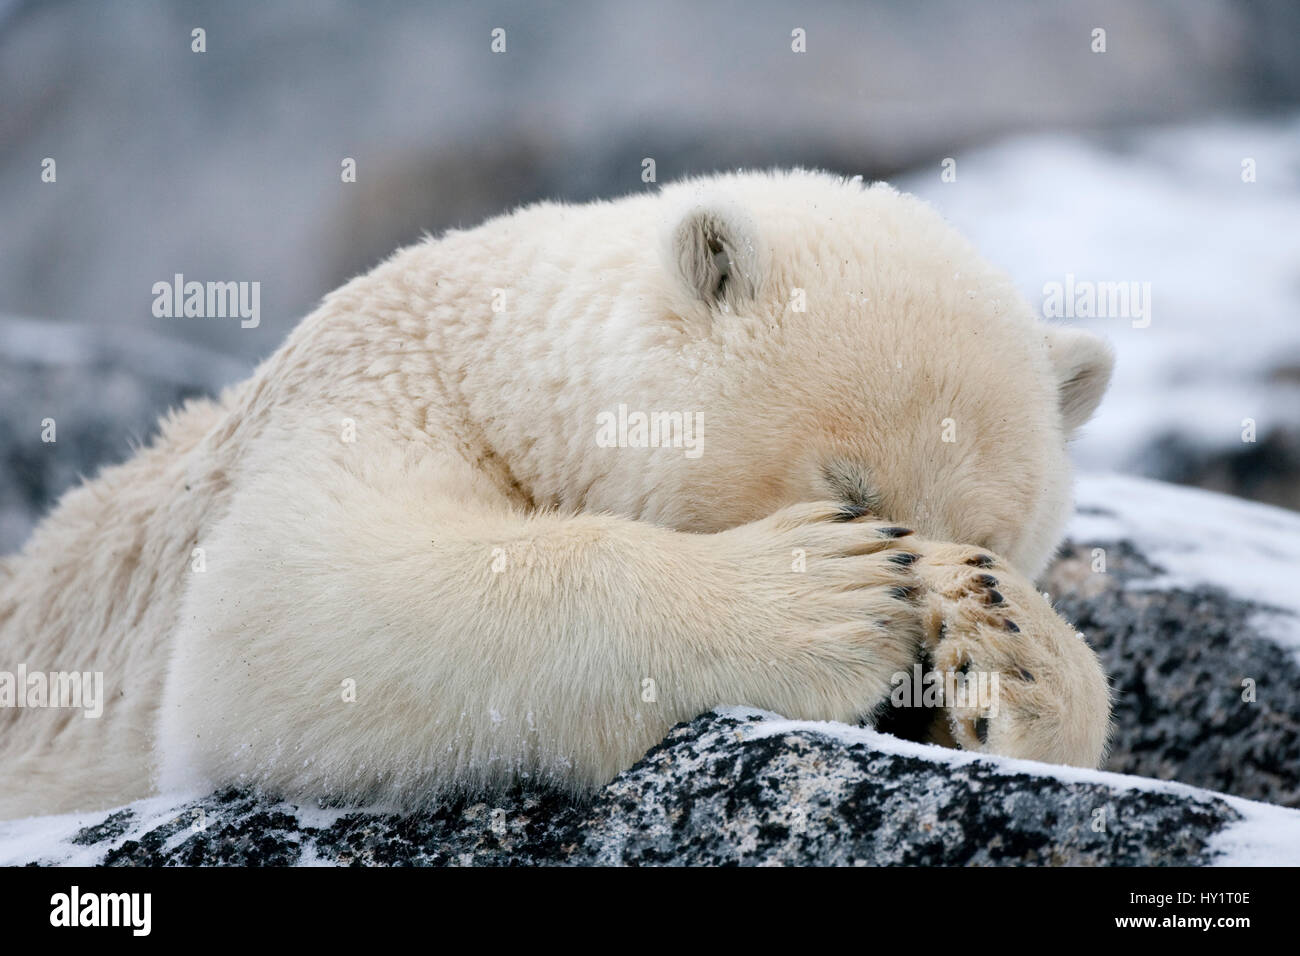 RF- Polar bear (Ursus maritimus) with paws covering eyes, Svalbard, Norway, September 2009. Endangered species. Stock Photo